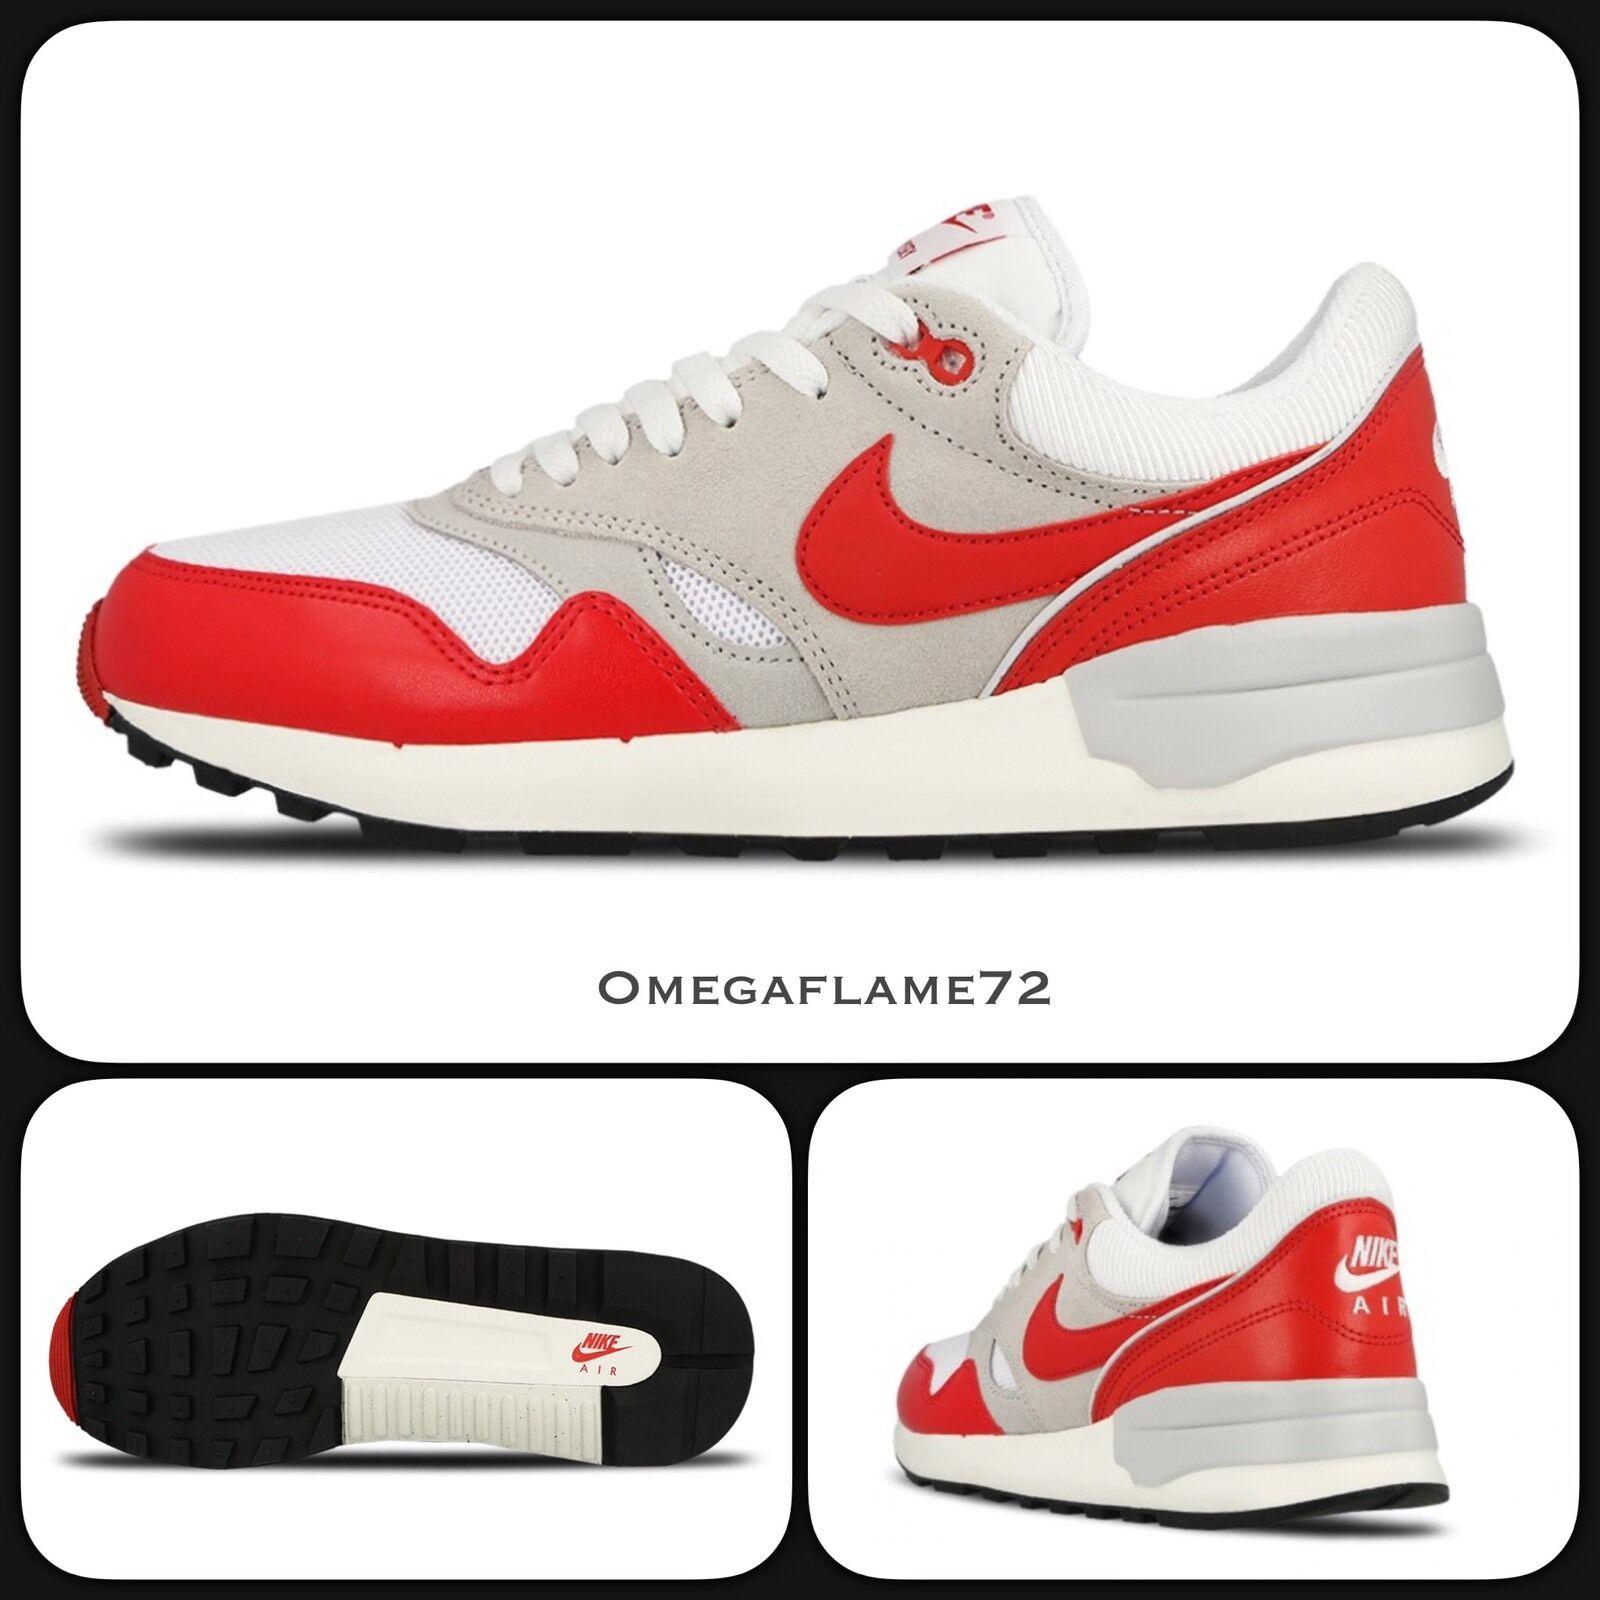 Nike Air Odyssey OG, Max 1 Light 652989-1068 EUR 42.5 US 9 Day  Atmos